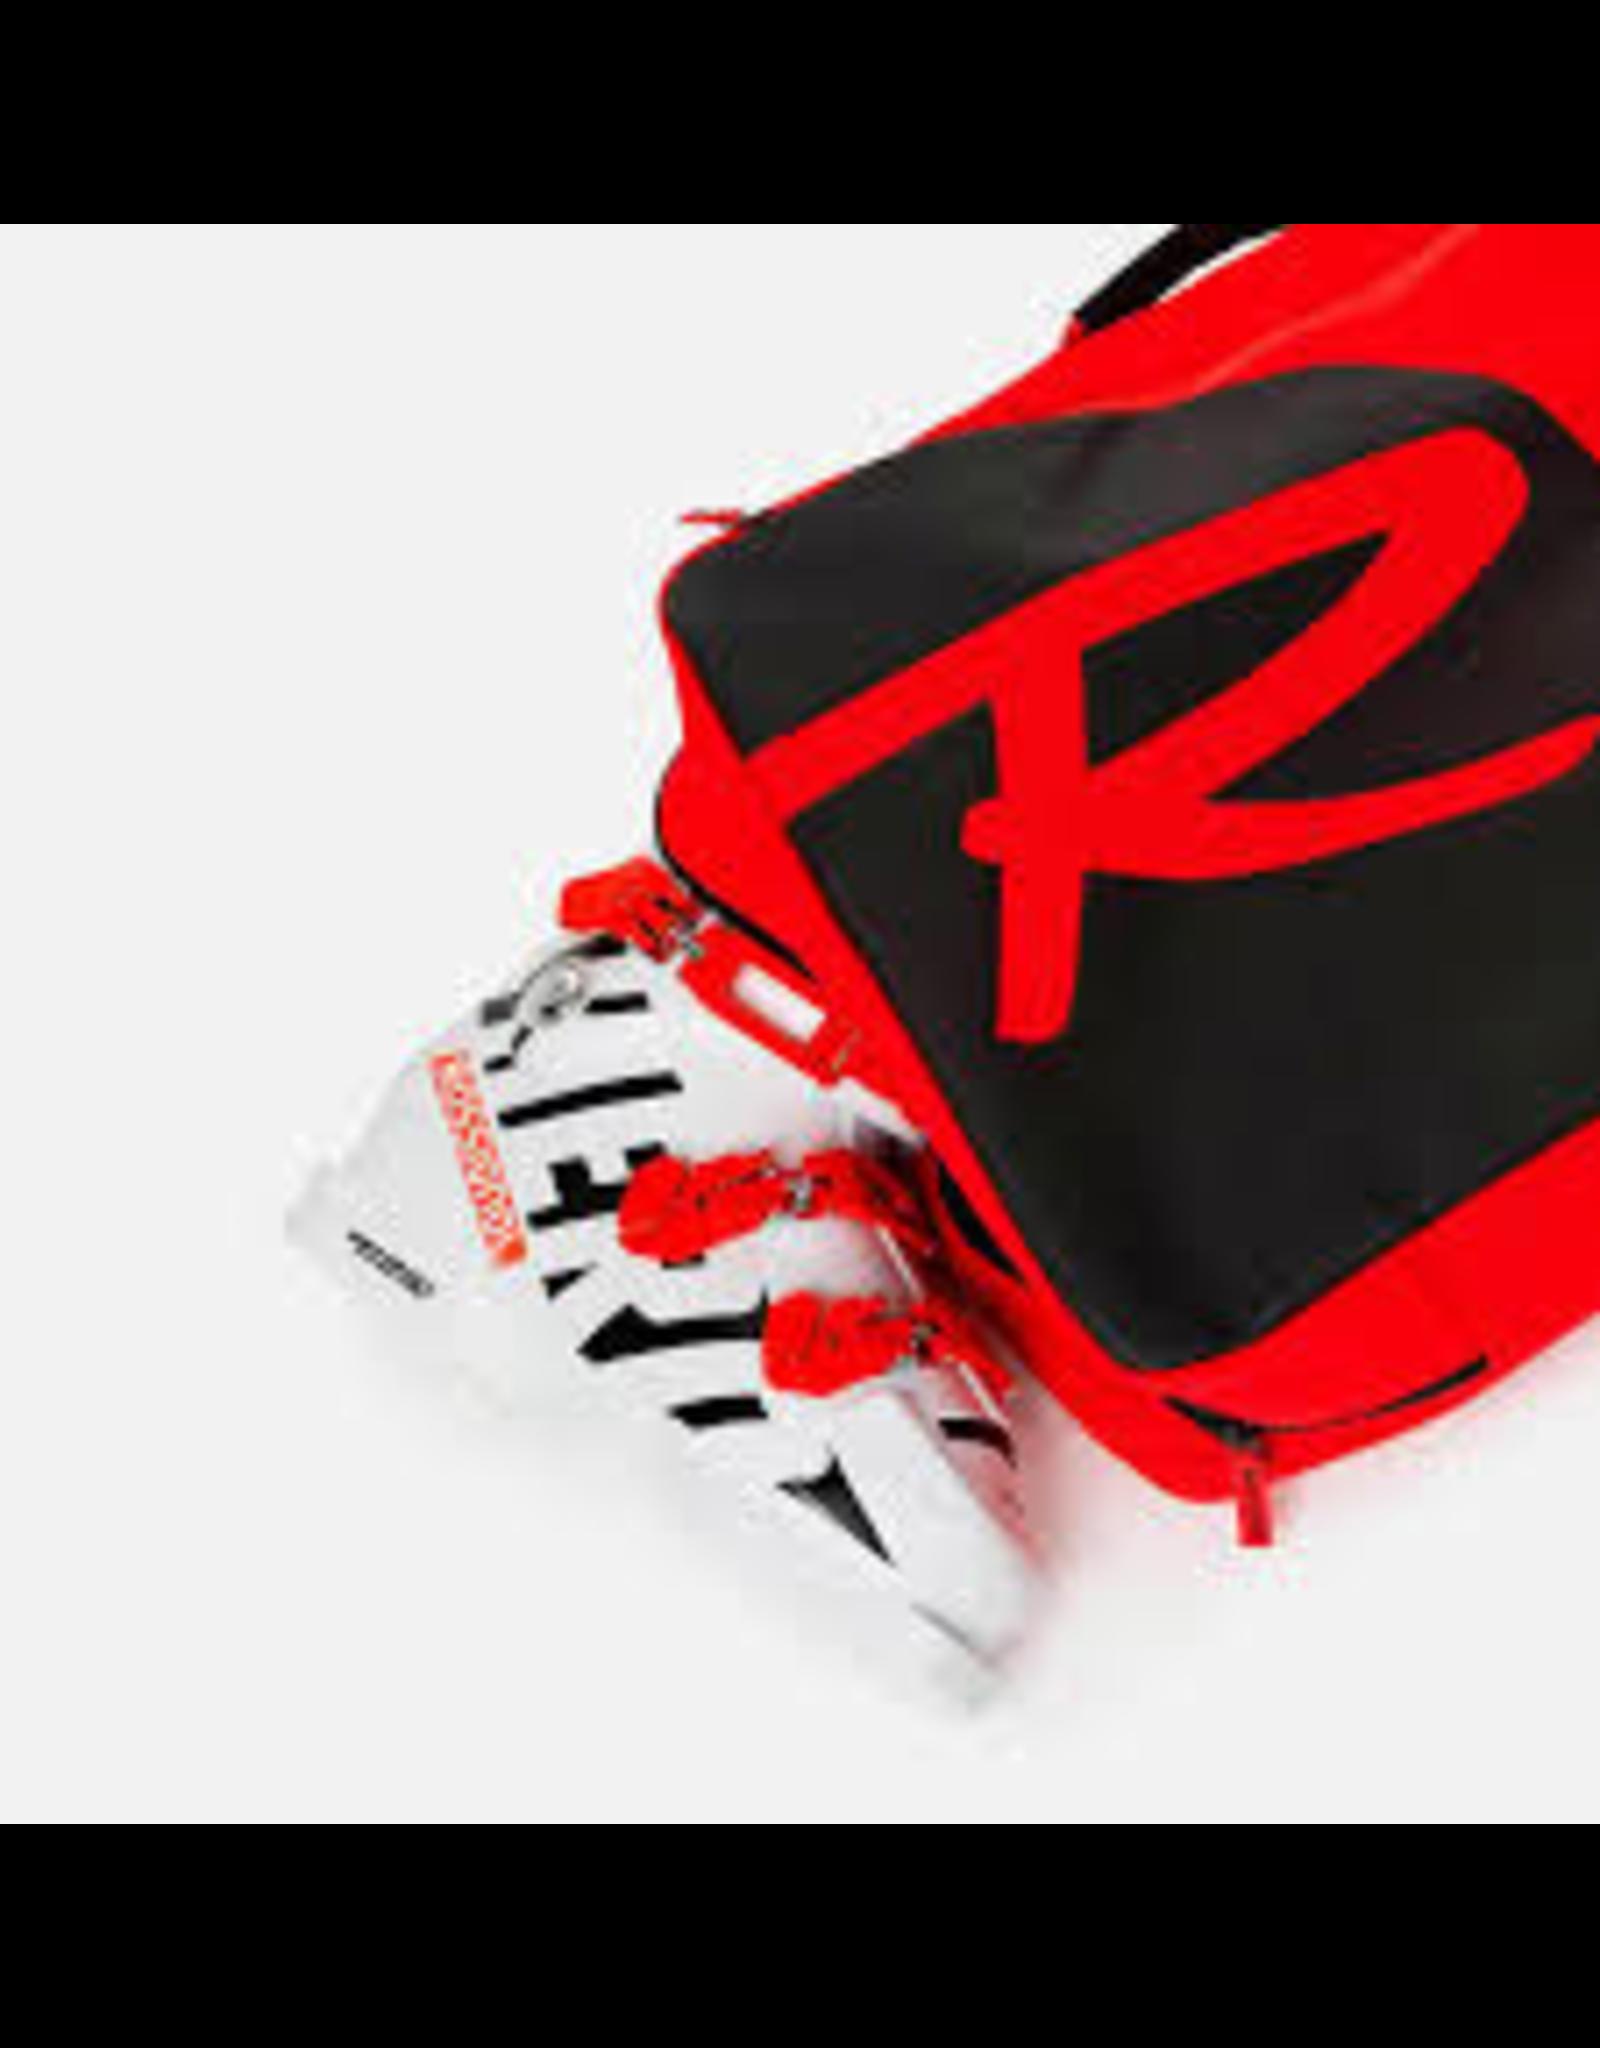 Rossignol Bootbage Ski Racing Unisexe Hero Dual